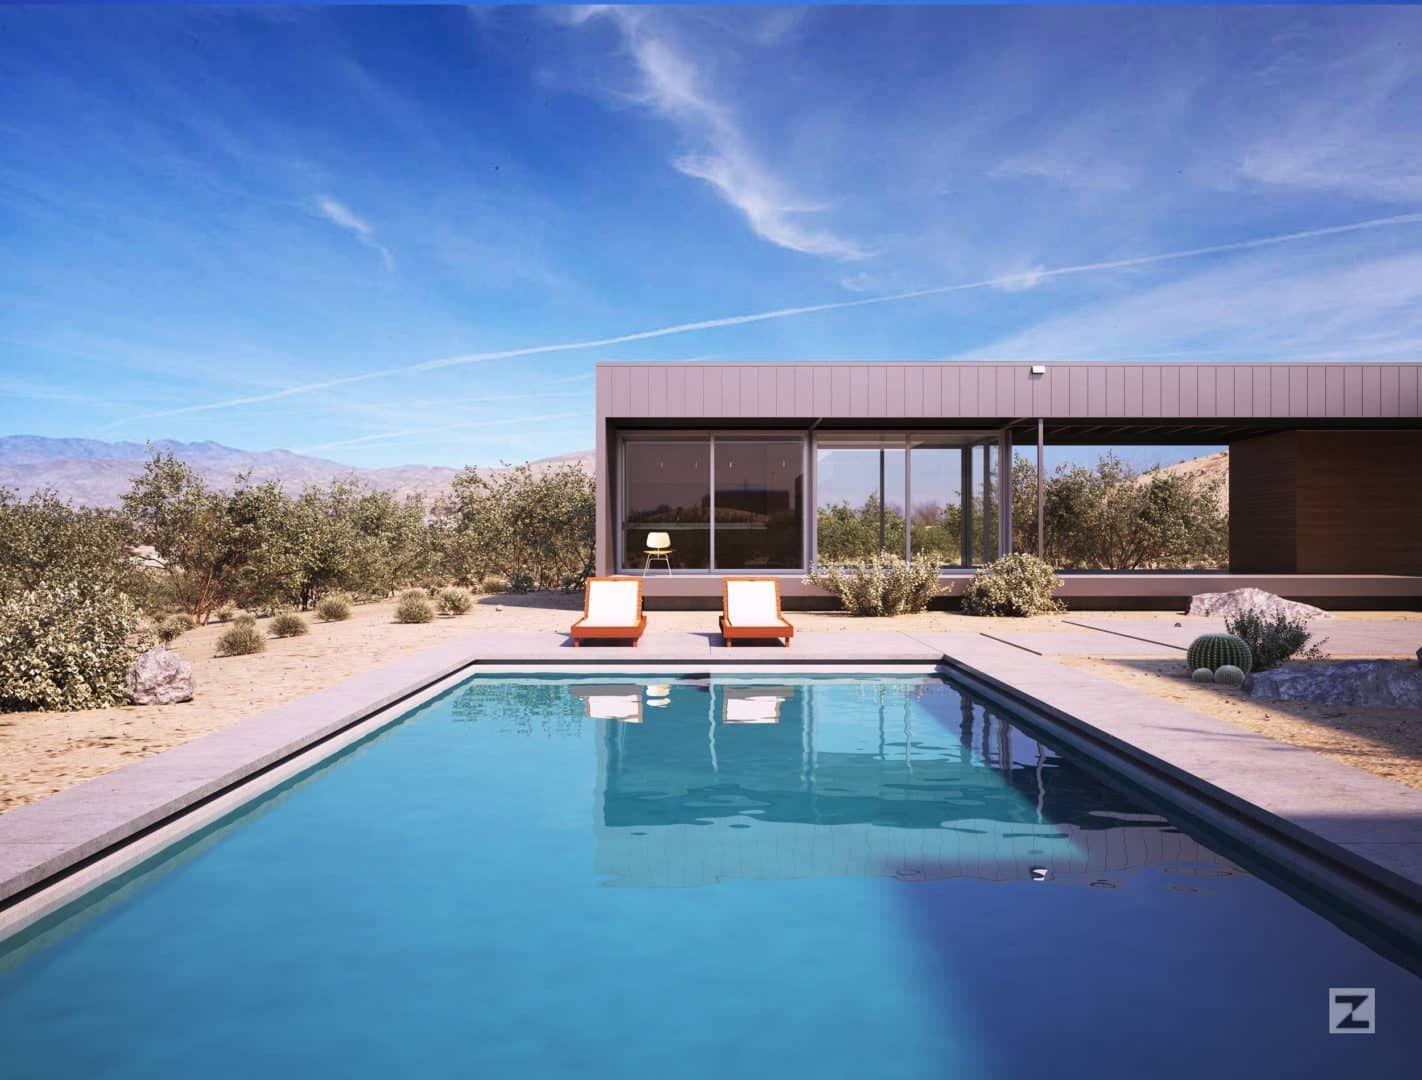 Desert House By Juan K Torres Cadservices 3d Archviz Architectural Visualization Wo Desert Homes 3d Architectural Visualization Prefabricated Architecture